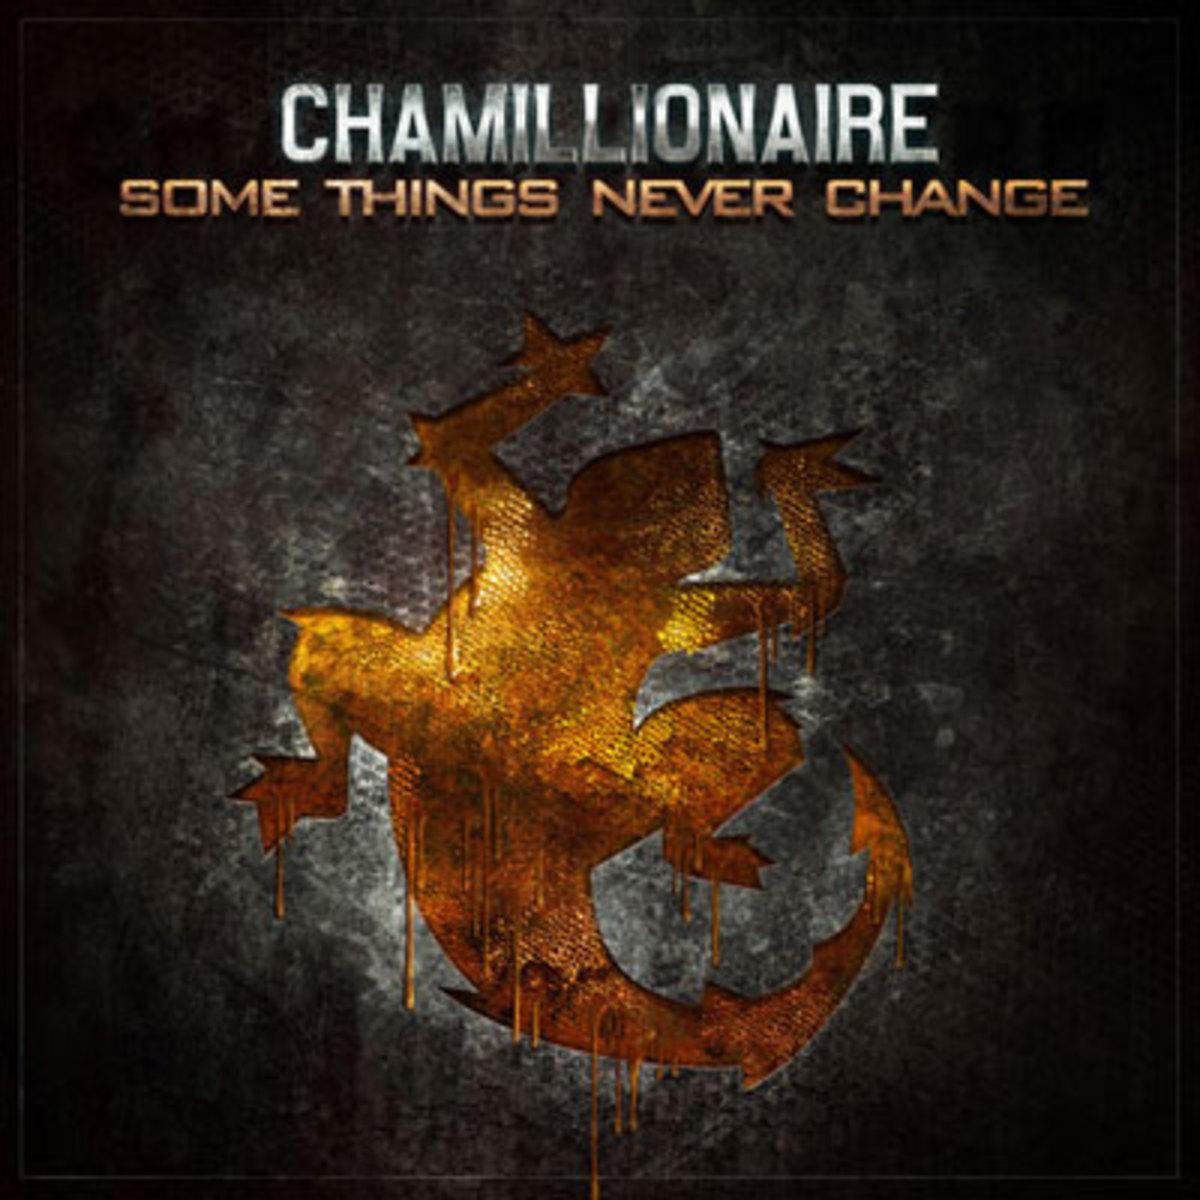 chamillionaire-something.jpg